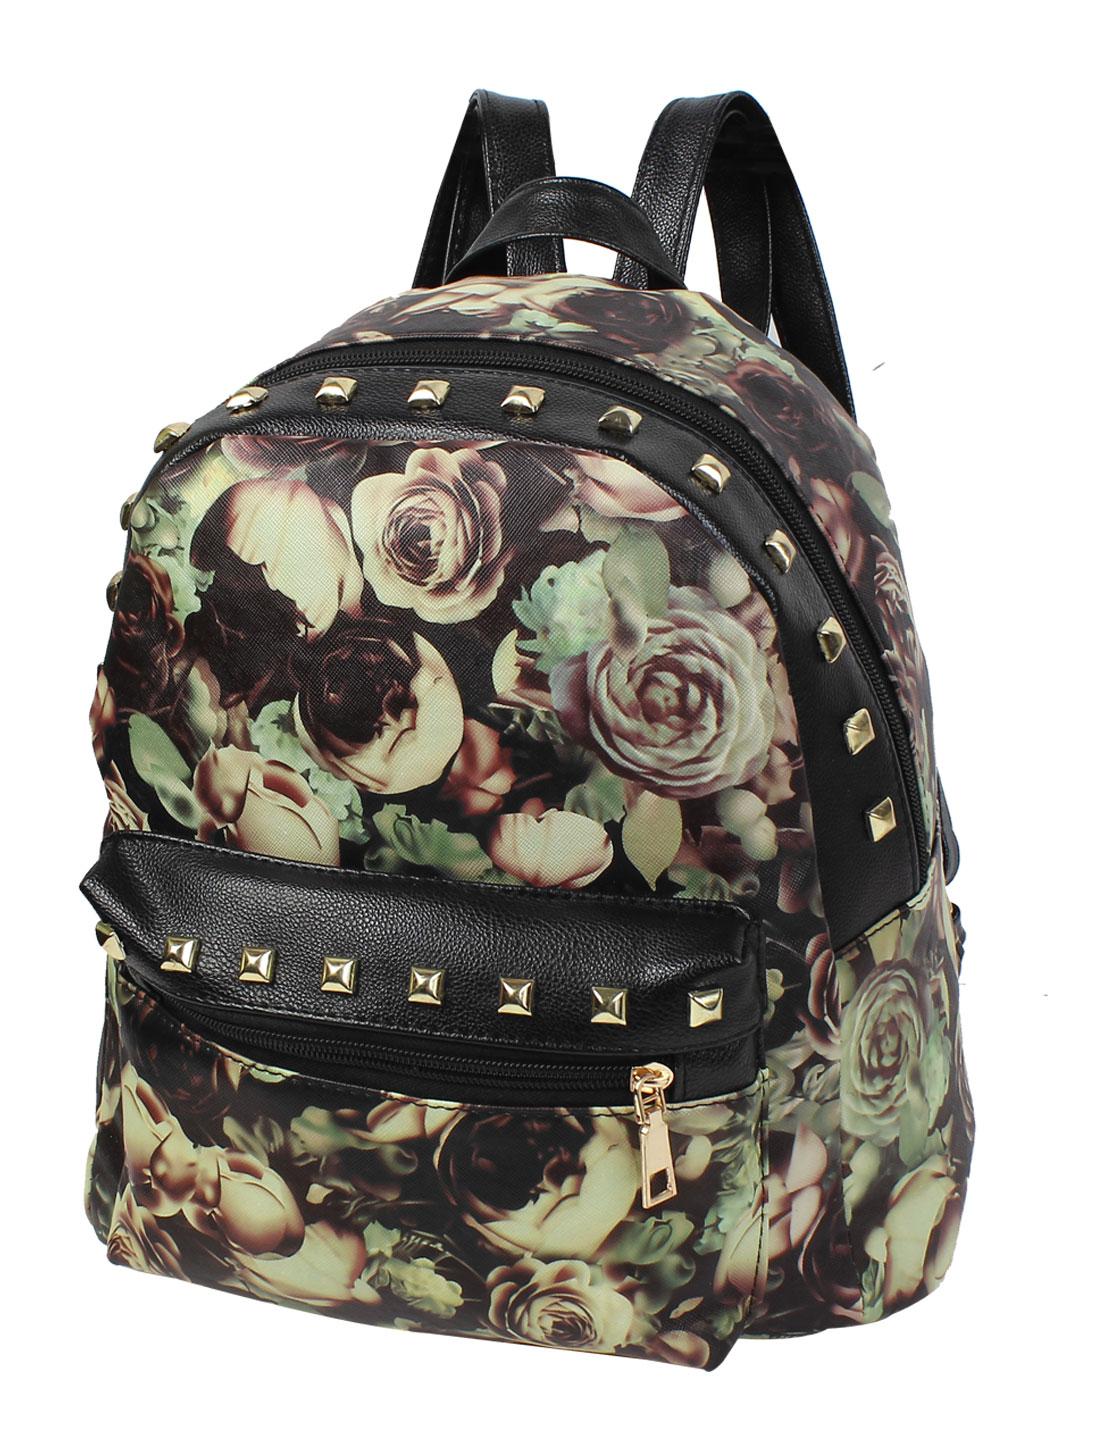 Preppy Style Flower Print Rivet Faux Leather Outdoor Backpack Satchel Bookbag